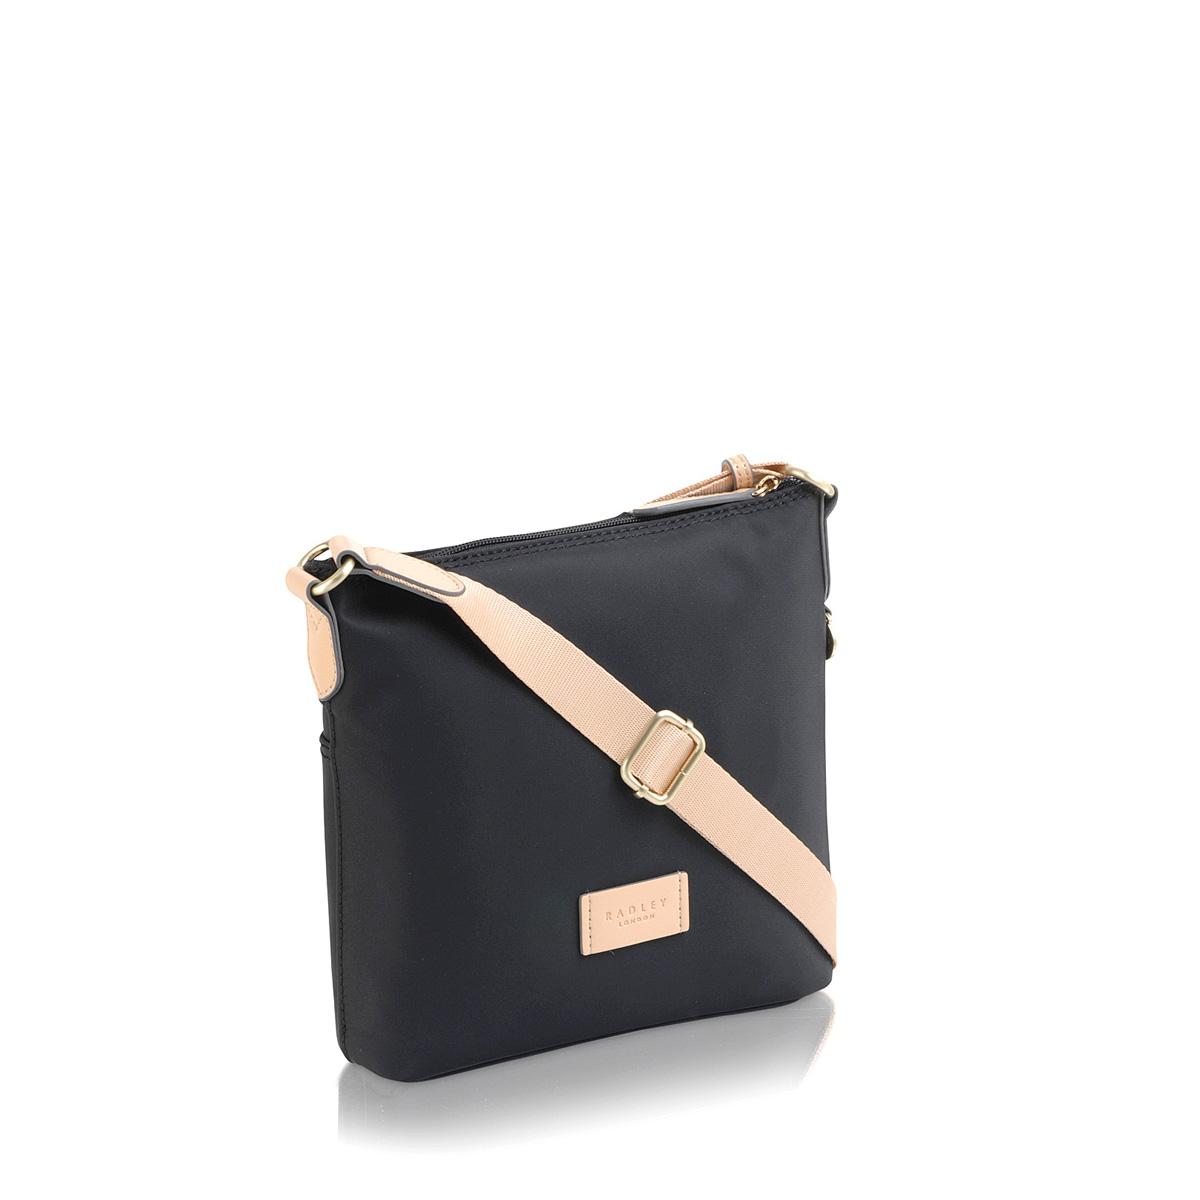 Radley Pocket Essentials Small Cross Body Bag Cheap Sale Pick A Best Wide Range Of Online Low Shipping Cheap Online Great Deals BGDR0fa8J